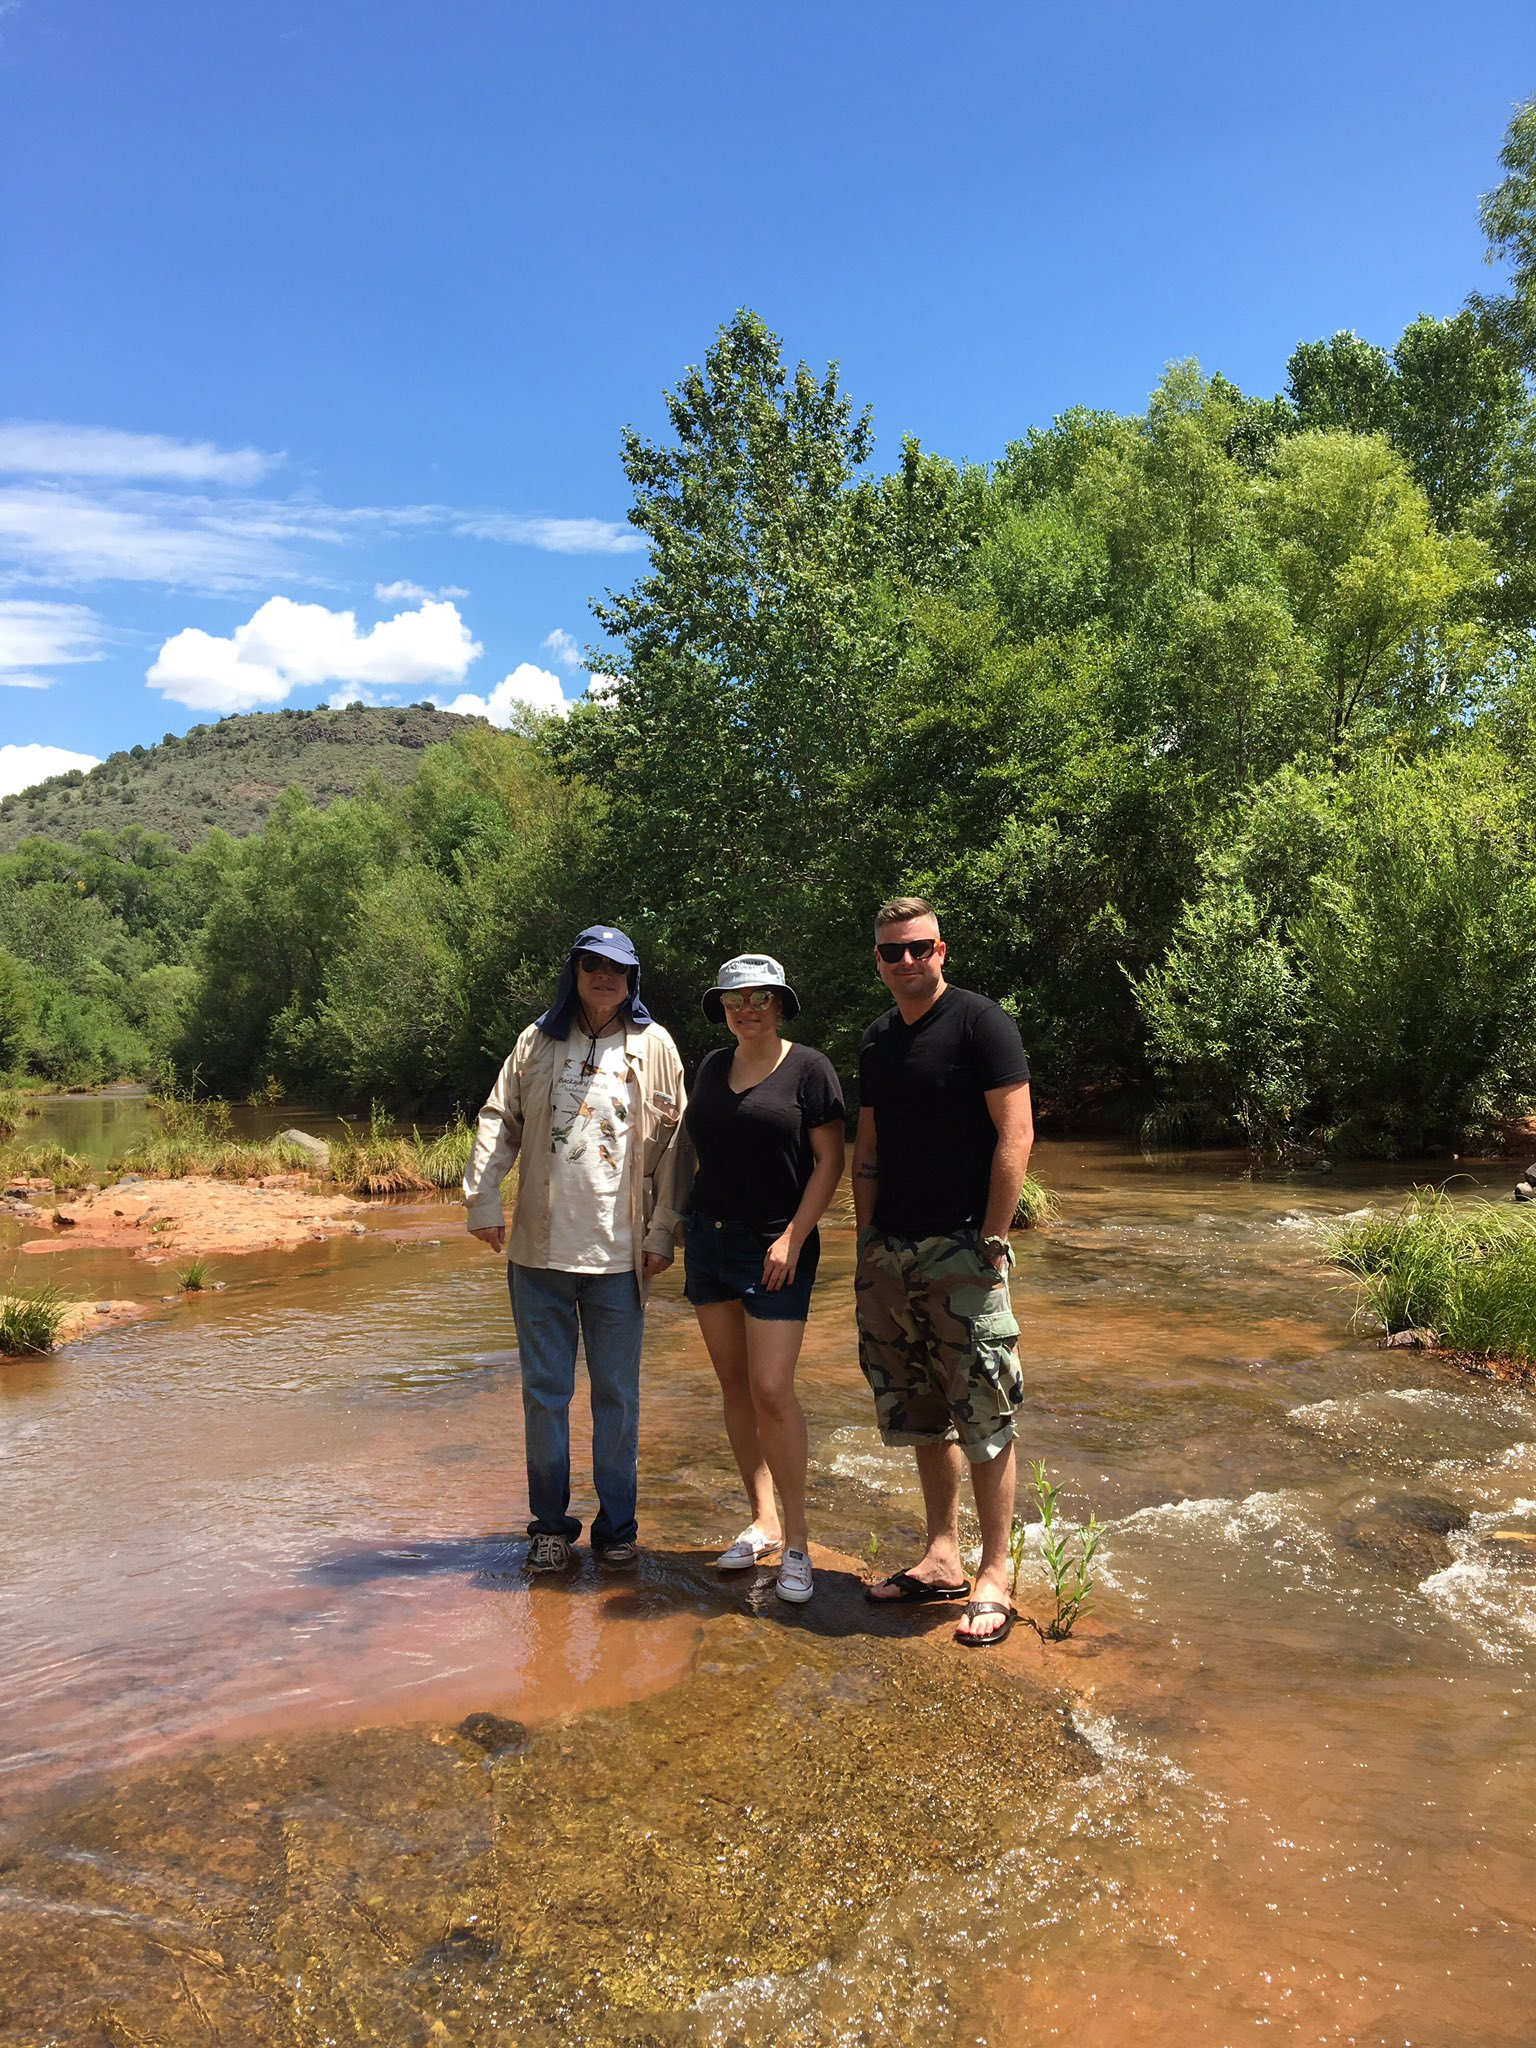 Saturday in Oak Creek with @MeghanMcCain & Jimmy McCain #Arizona https://t.co/Pz6QLXXH23